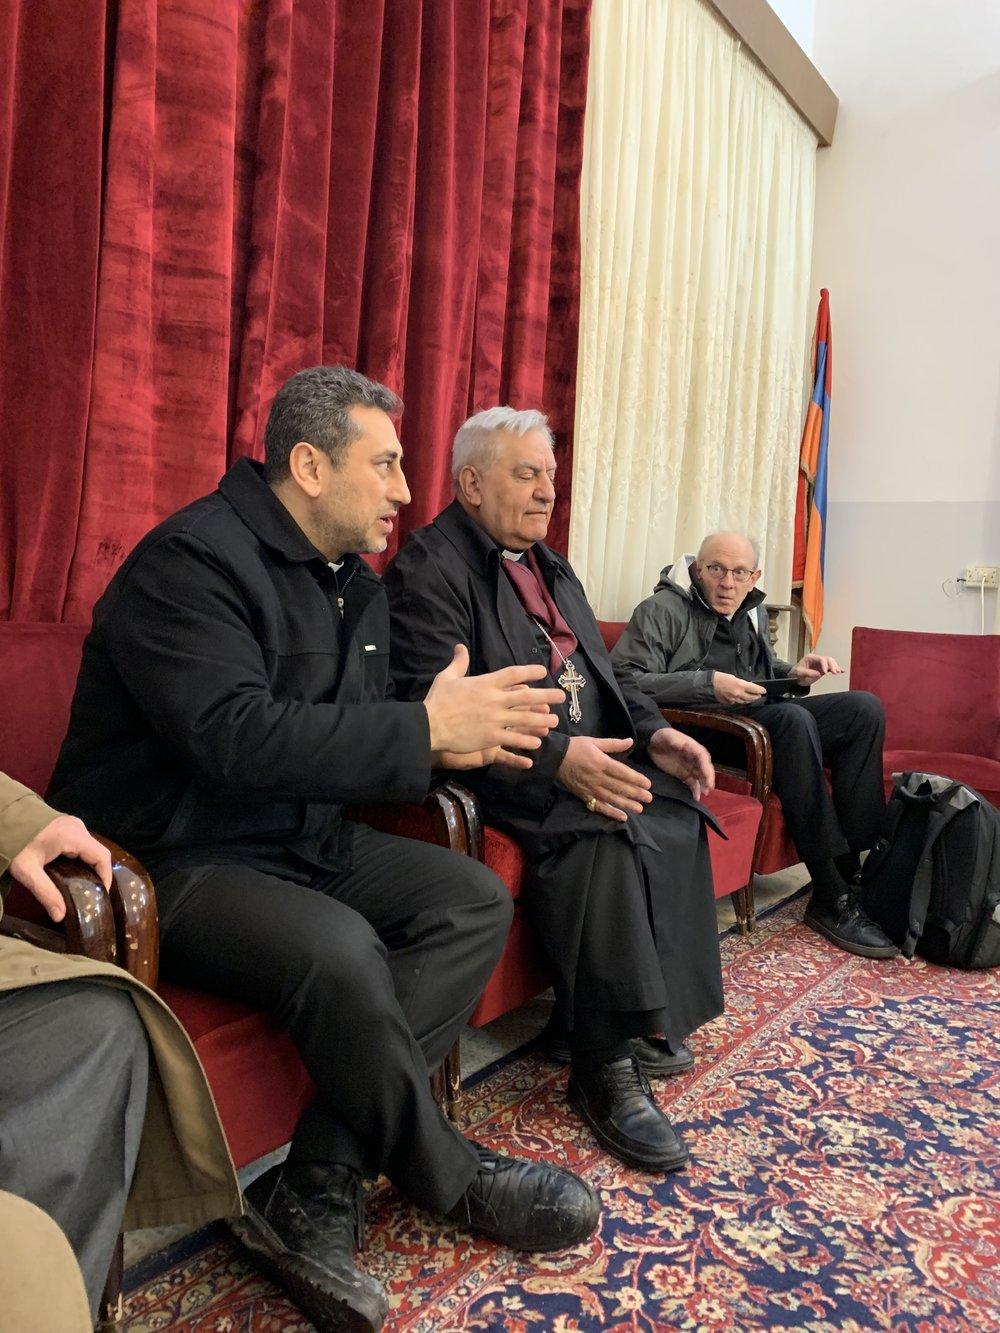 Rev. Firas with his spiritual big brother Armenian Catholic Bishop Antranig Avmerian